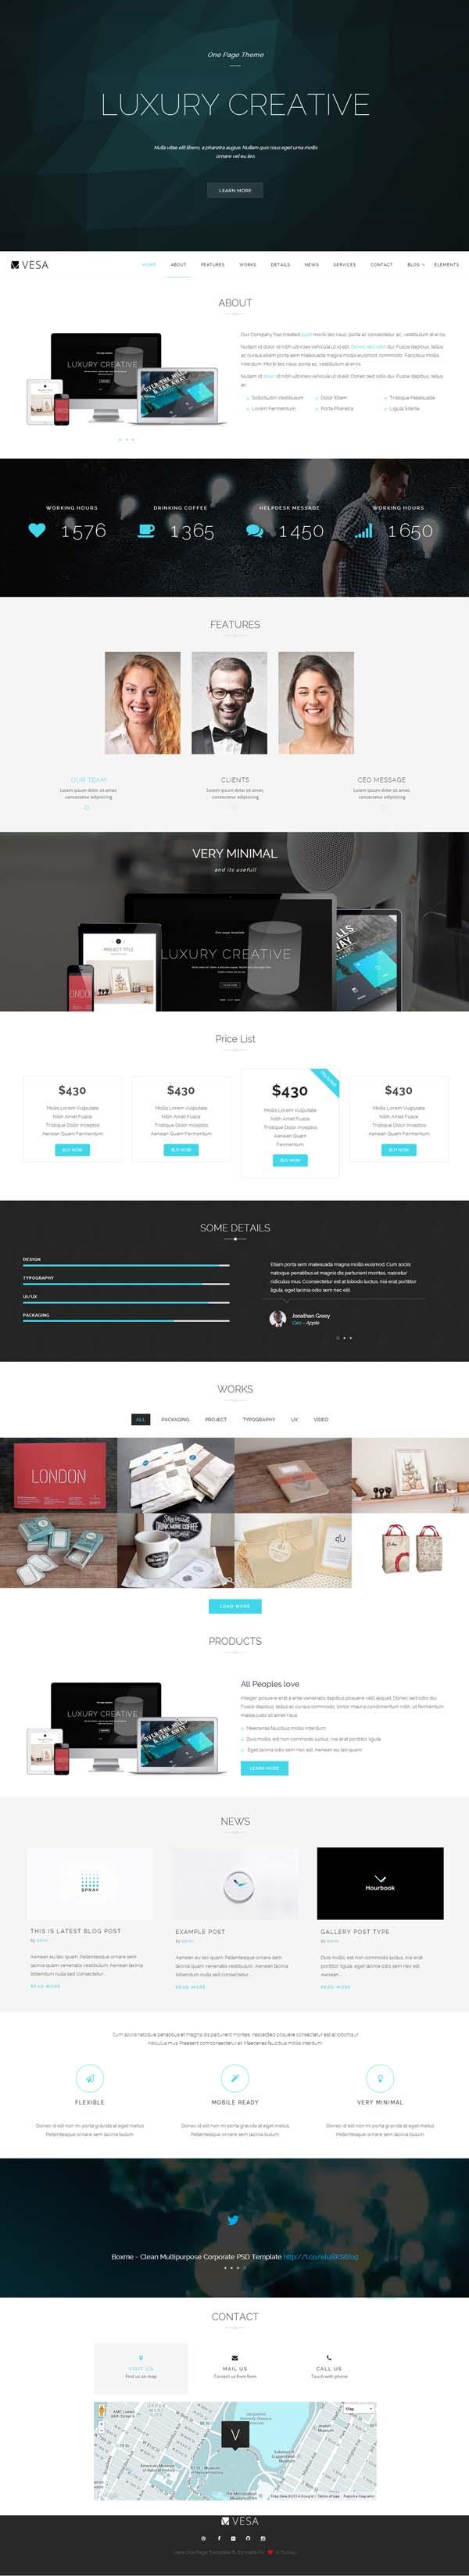 Vesa Responsive Parallax One Page WordPress Theme